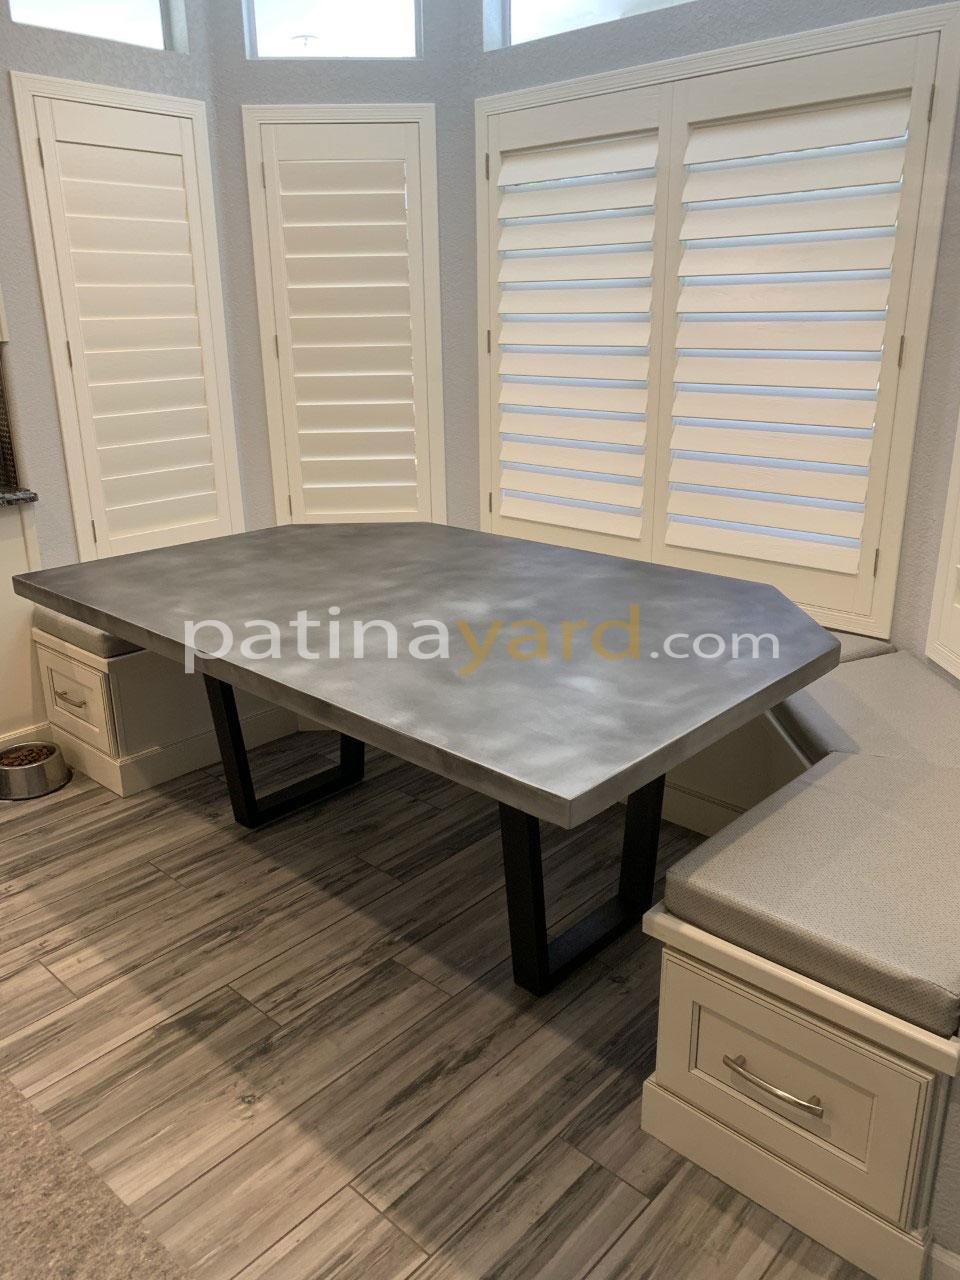 zinc table with u shaped metal legs